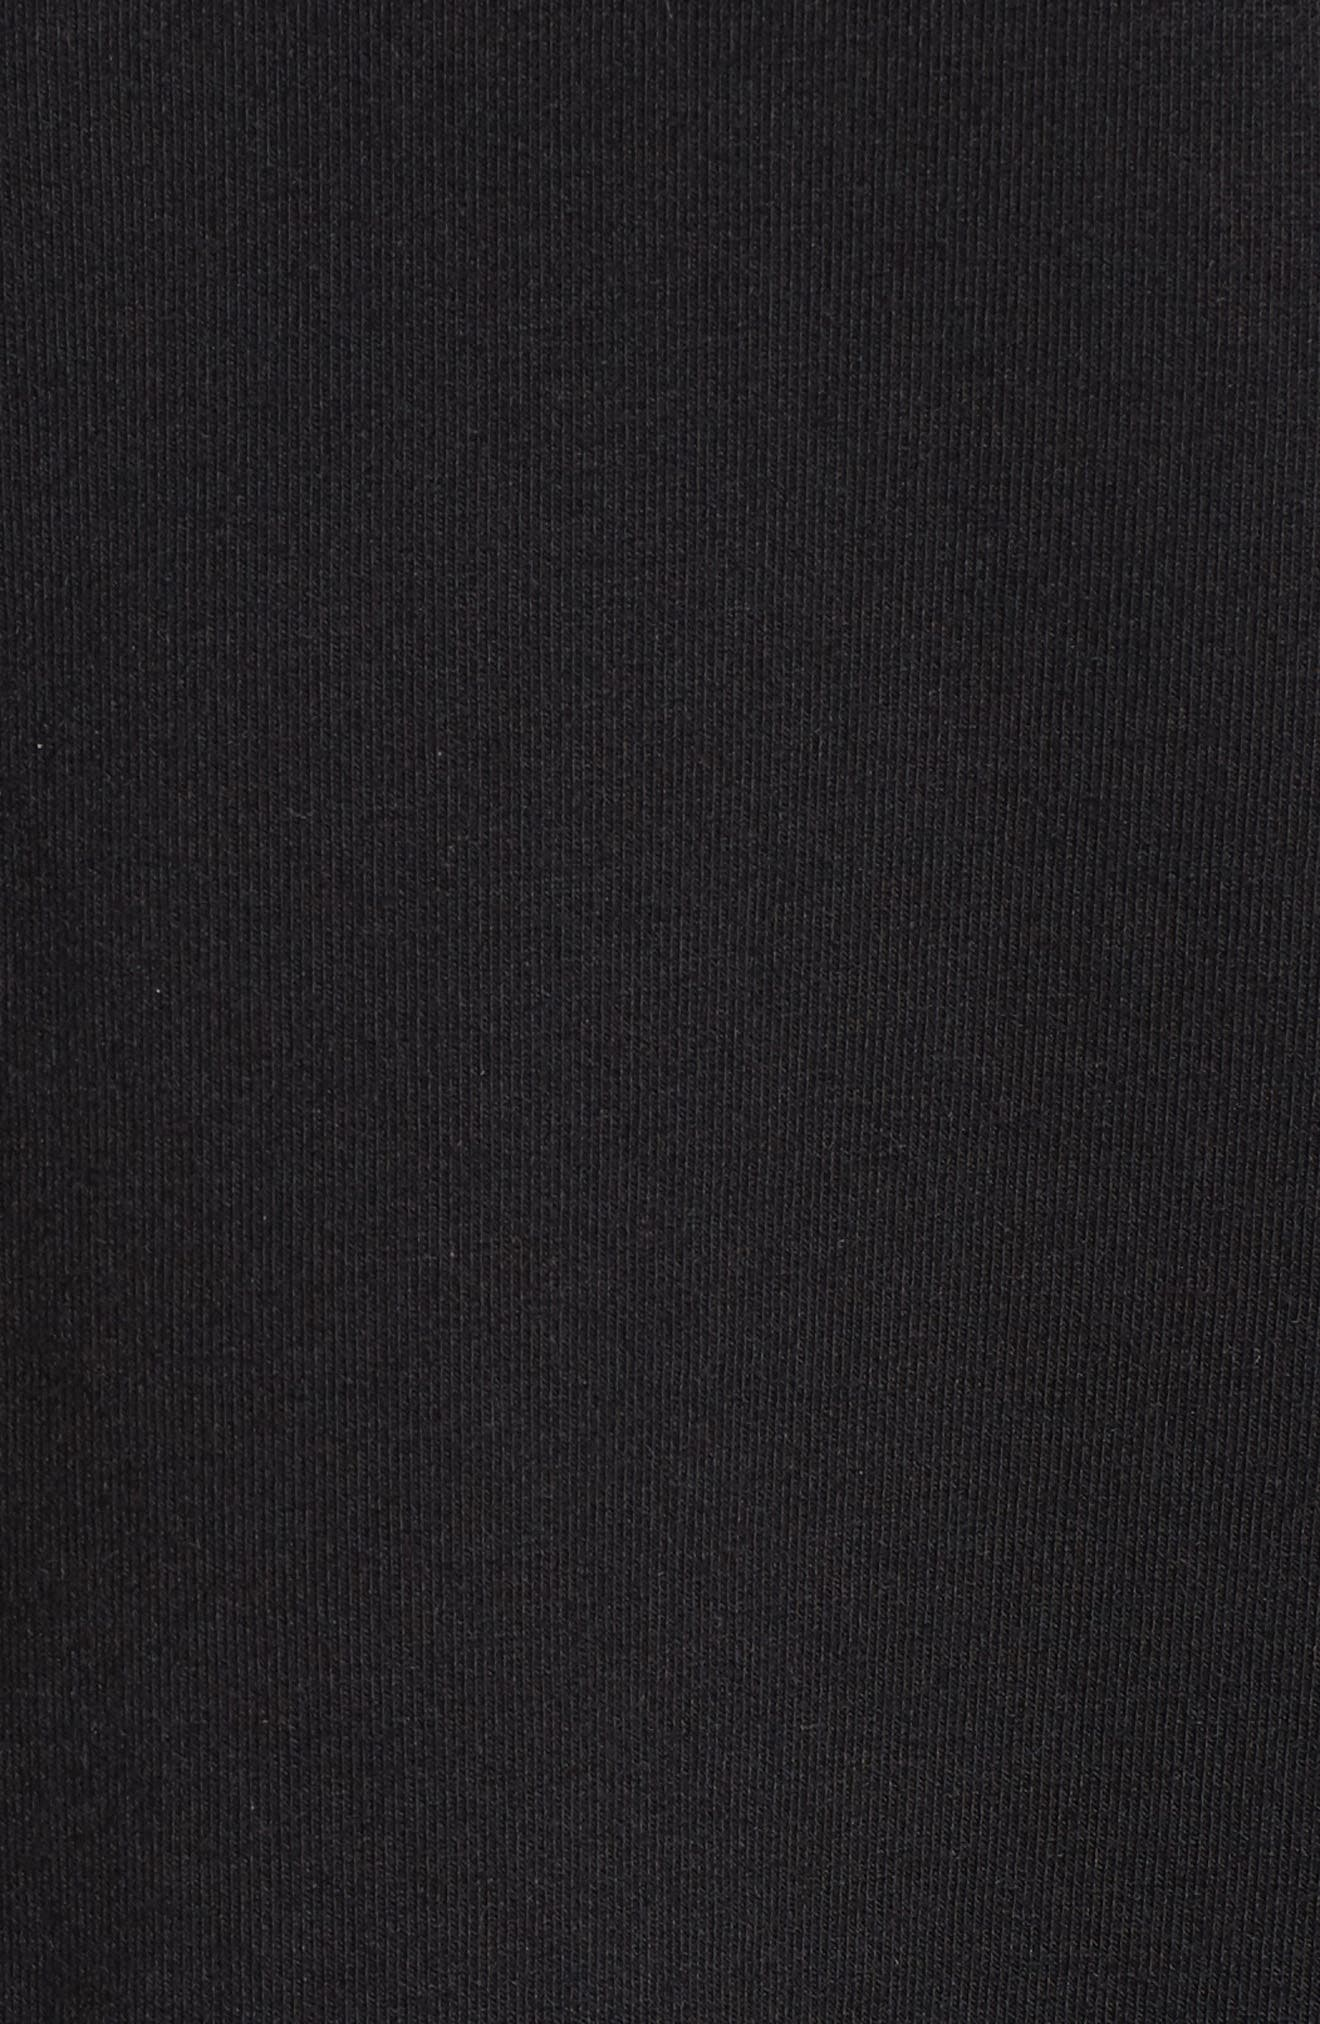 Lace Yoke Ruffle Top,                             Alternate thumbnail 5, color,                             001